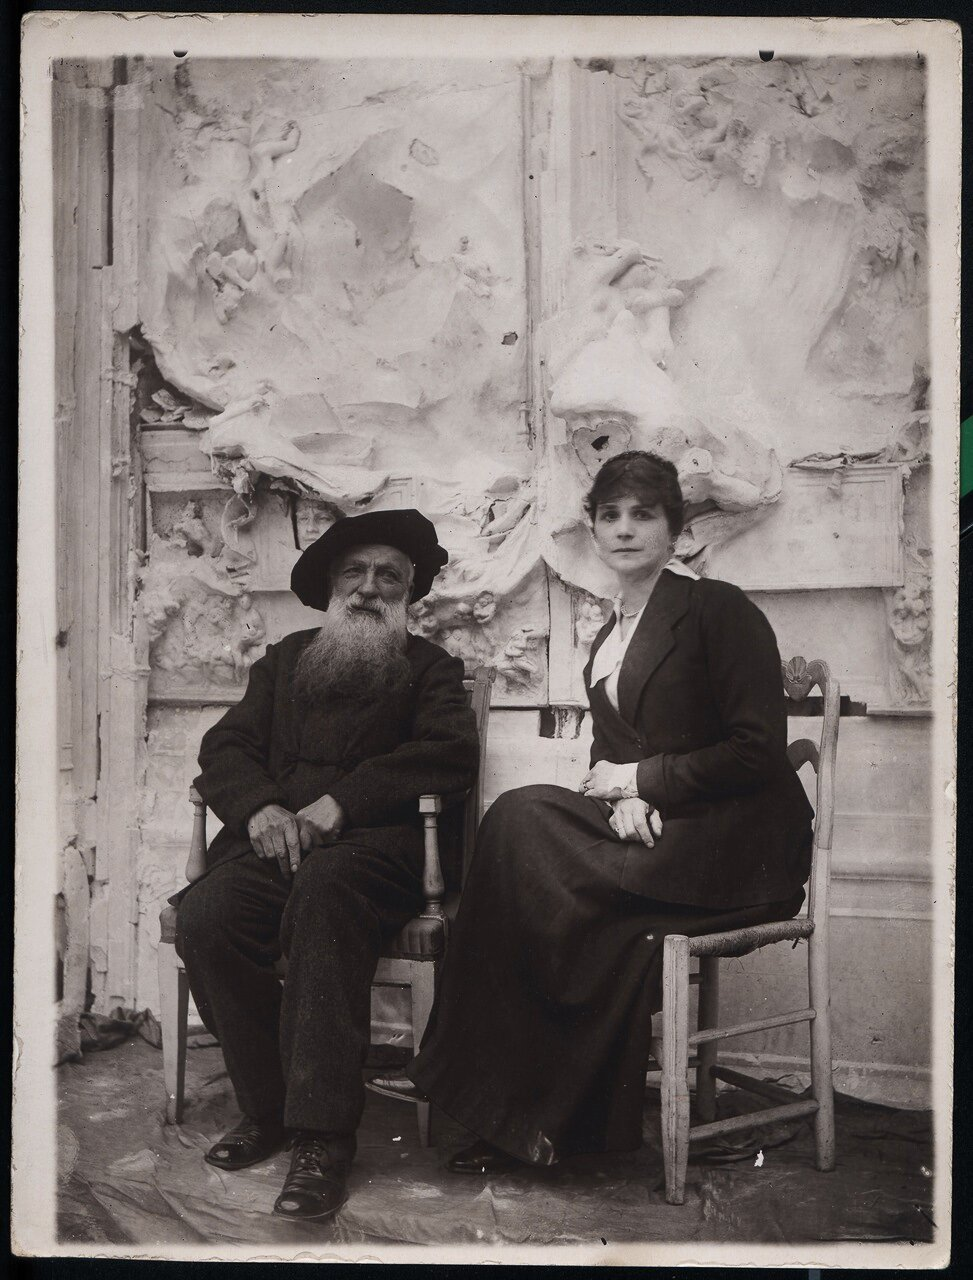 Огюст Роден и Генриетта Кольтат сидят у «Врат ада»